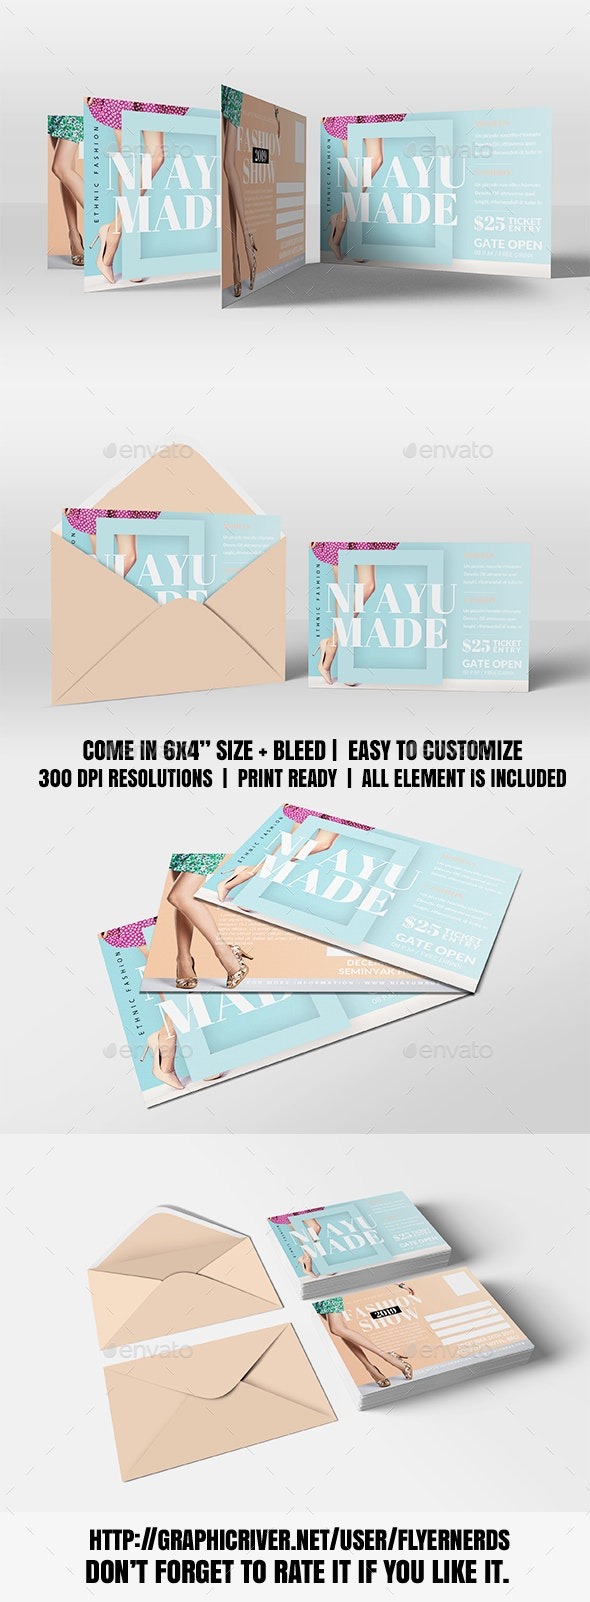 Fashion Design Promotion PostCard - Cards & Invites Print Templates